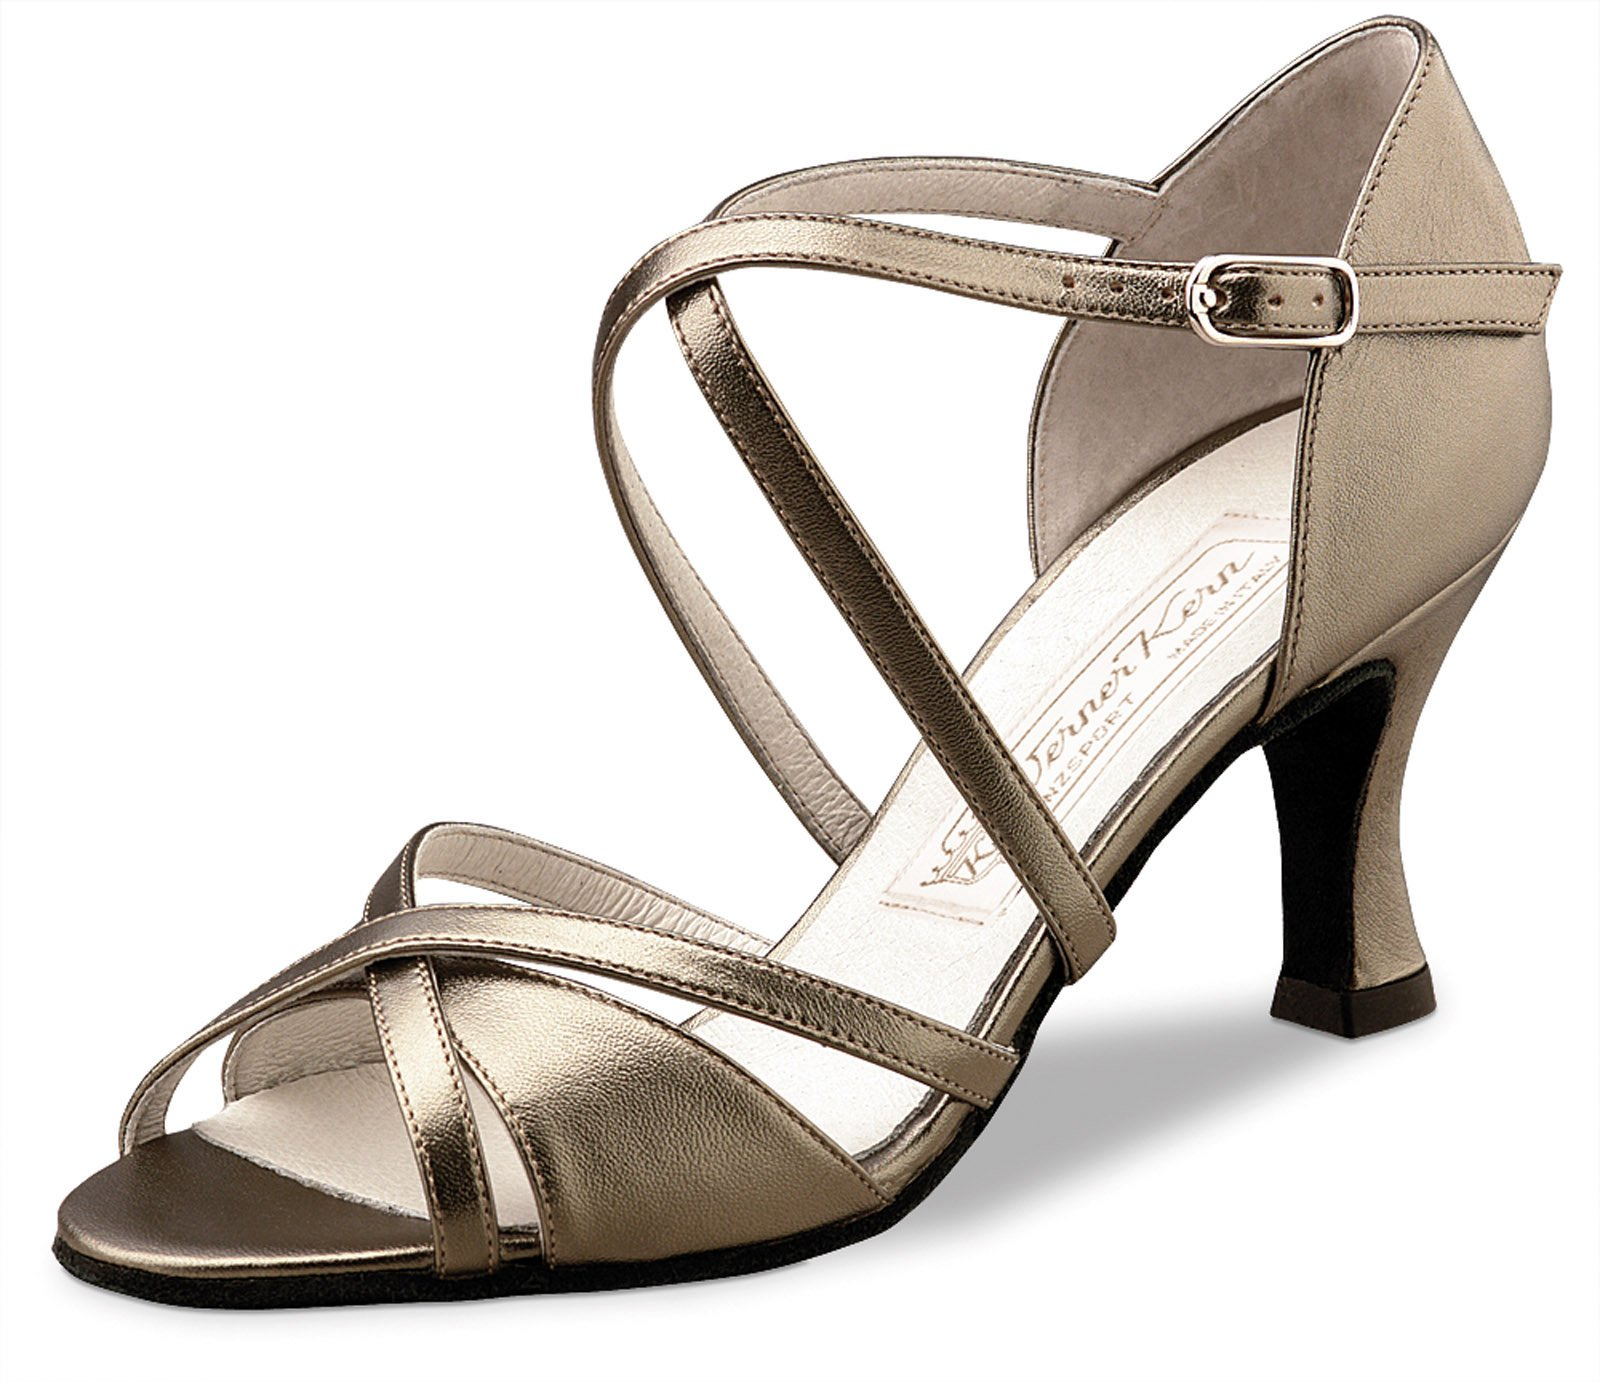 Werner Kern Women's July - 2 3/4'' (6.5 cm) Flare Heel, Chevro Antik, 8.5 M US (5.5 UK)